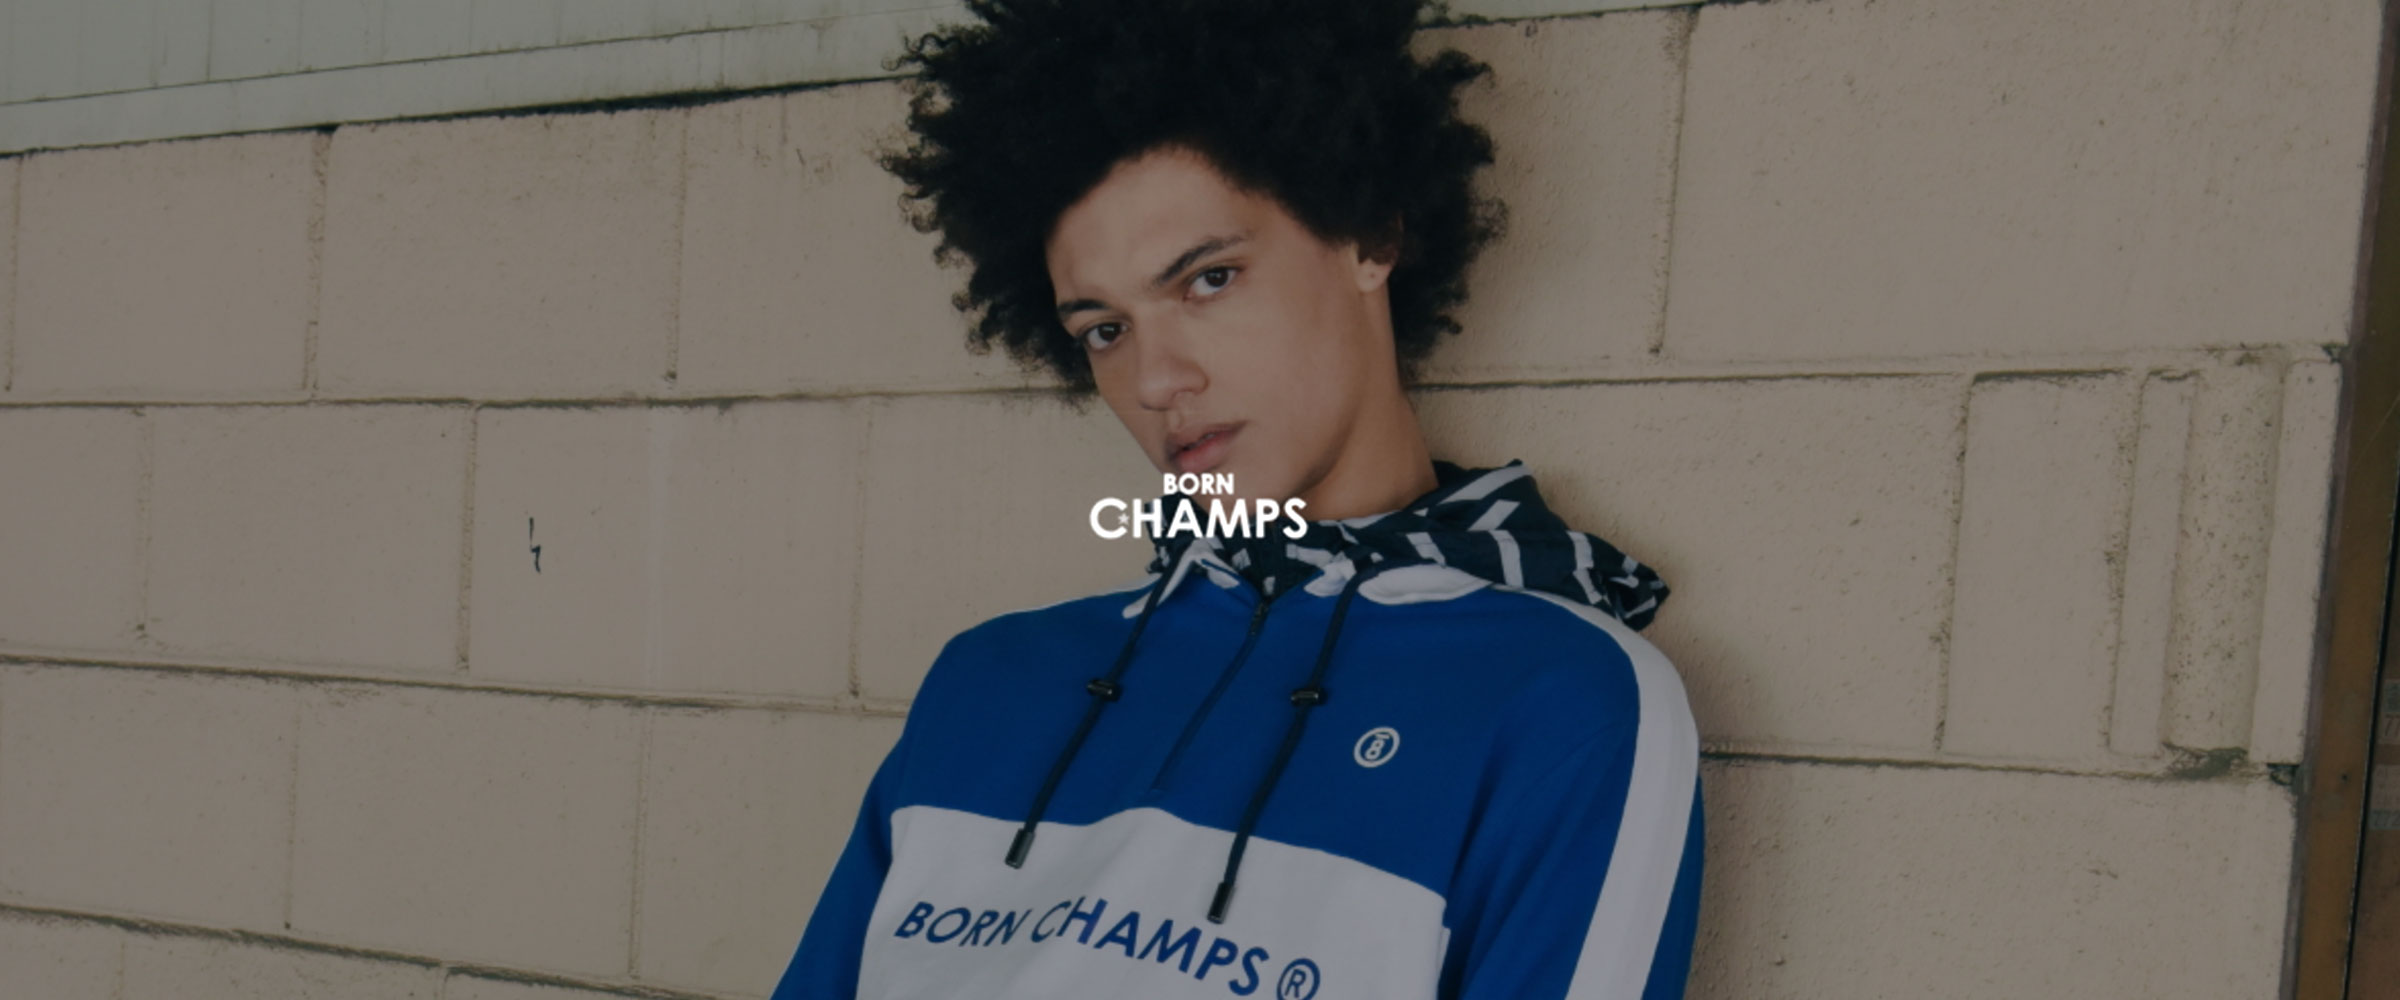 bornchamps.jpg